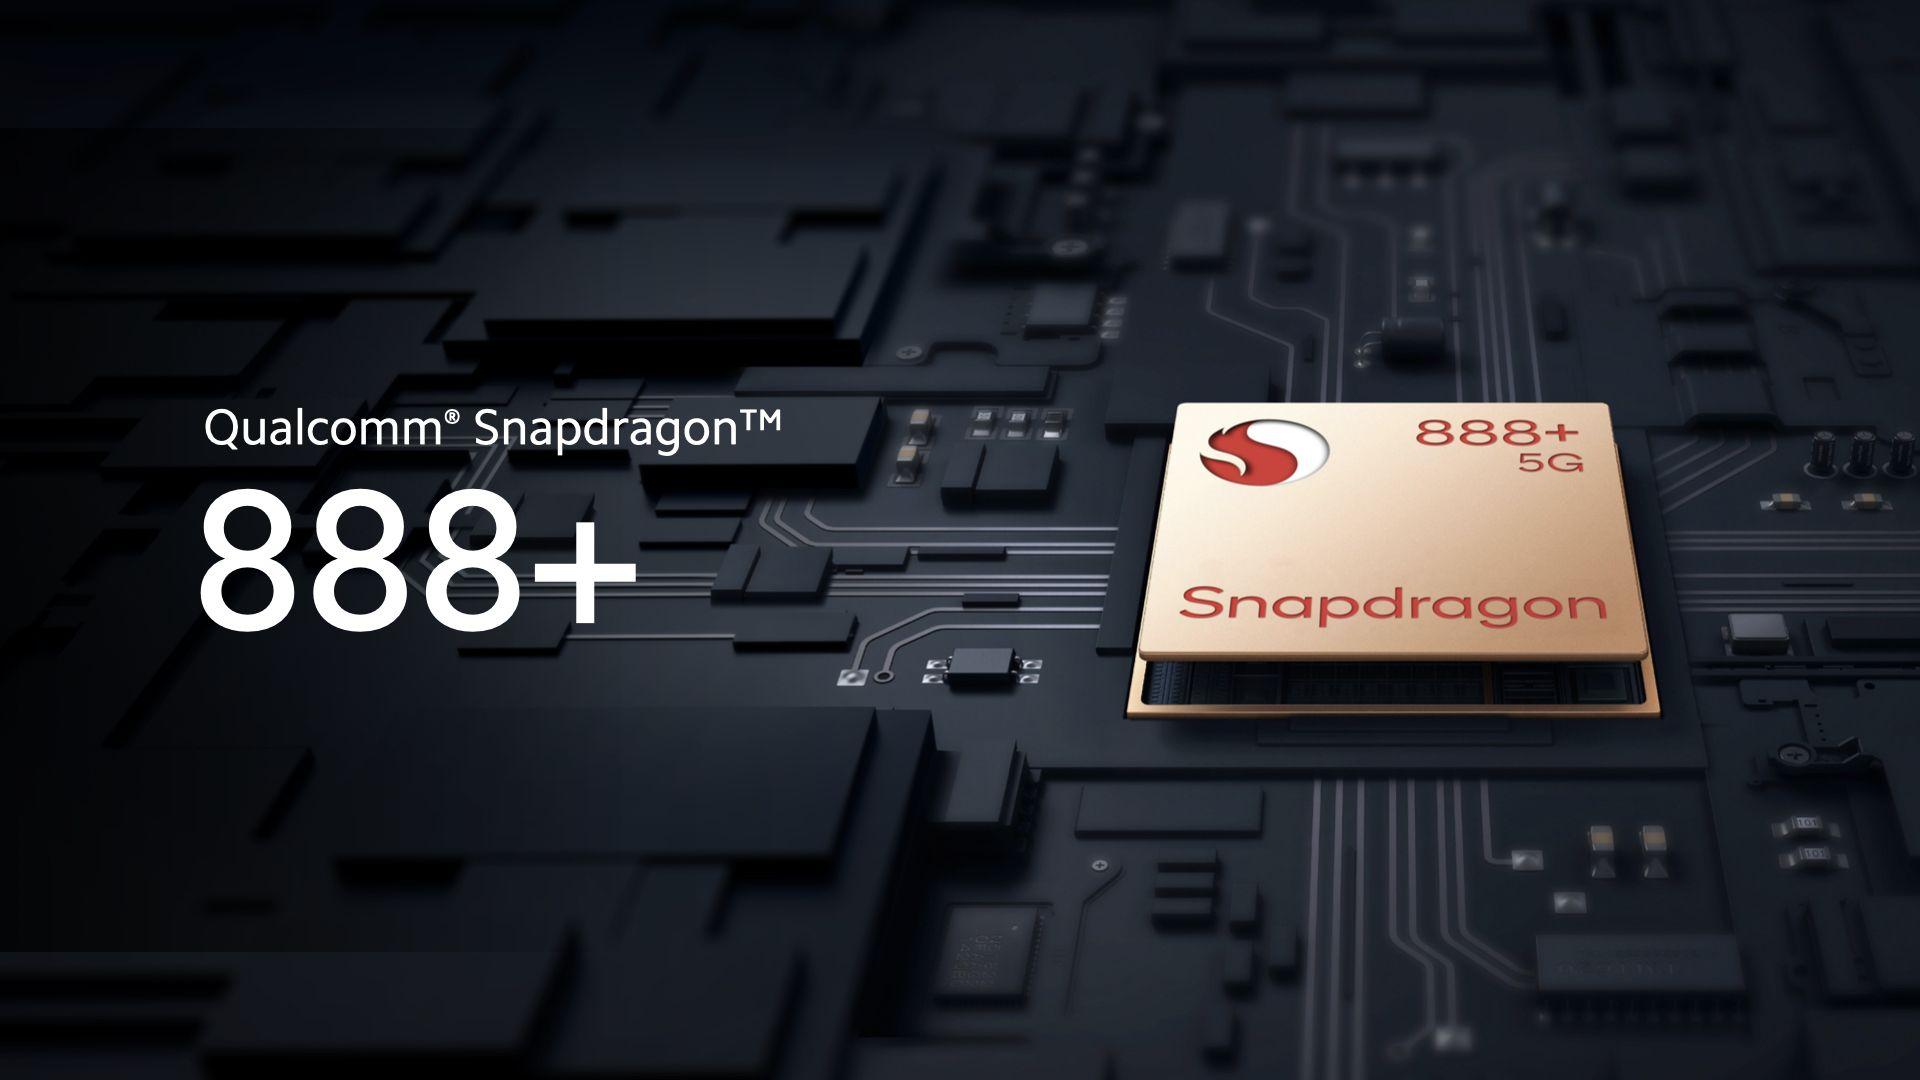 Snapdragon 888 Plus 5Gのベンチマークスコアが判明。VS. Snapdragon 888 5G、870 5G、865 Plus 5G、865 5G